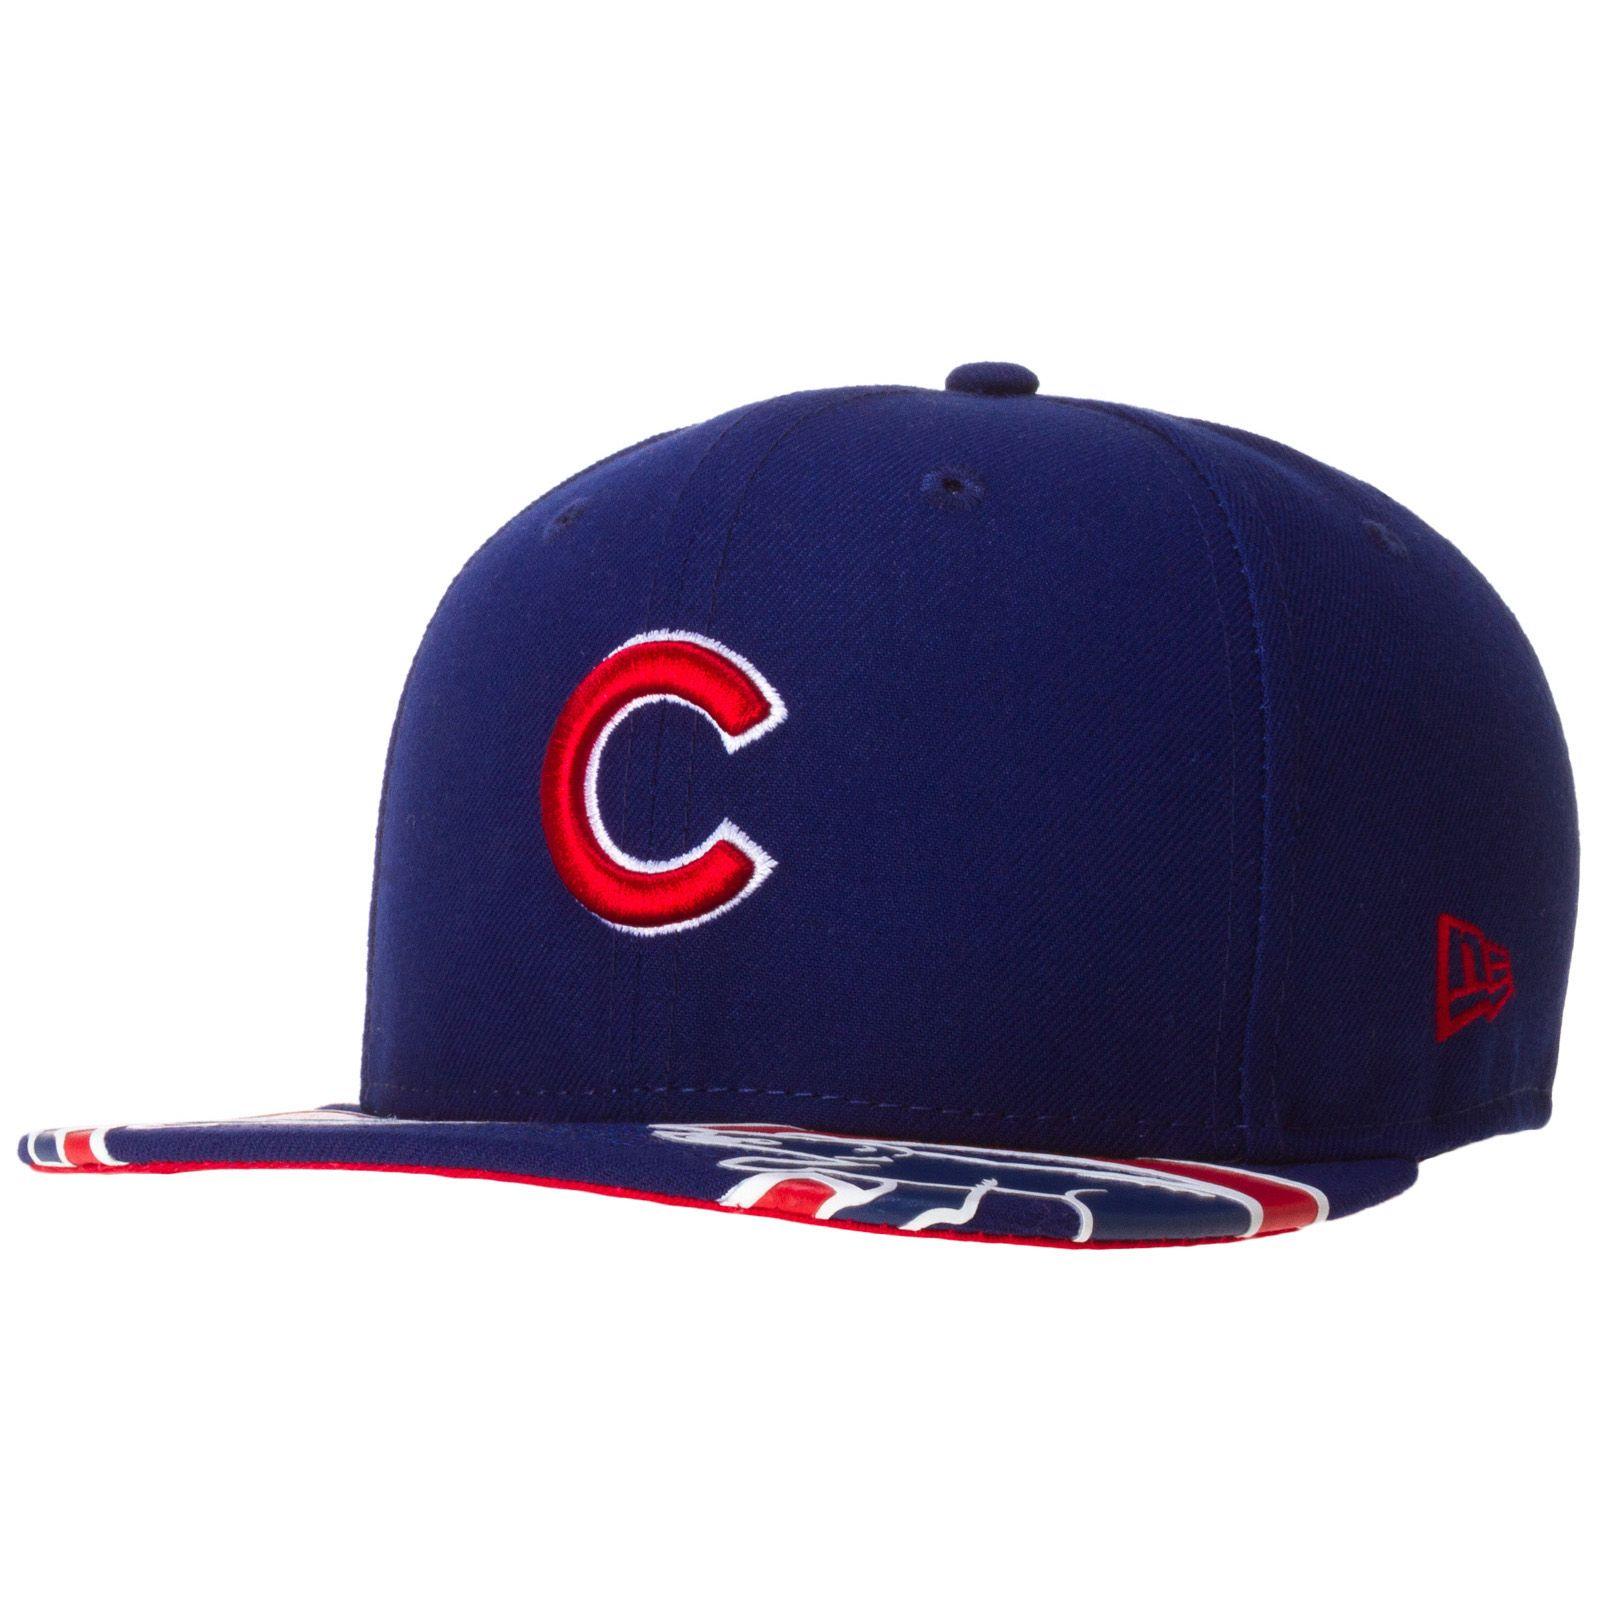 fbeaa3bd3 Chicago Cubs Royal